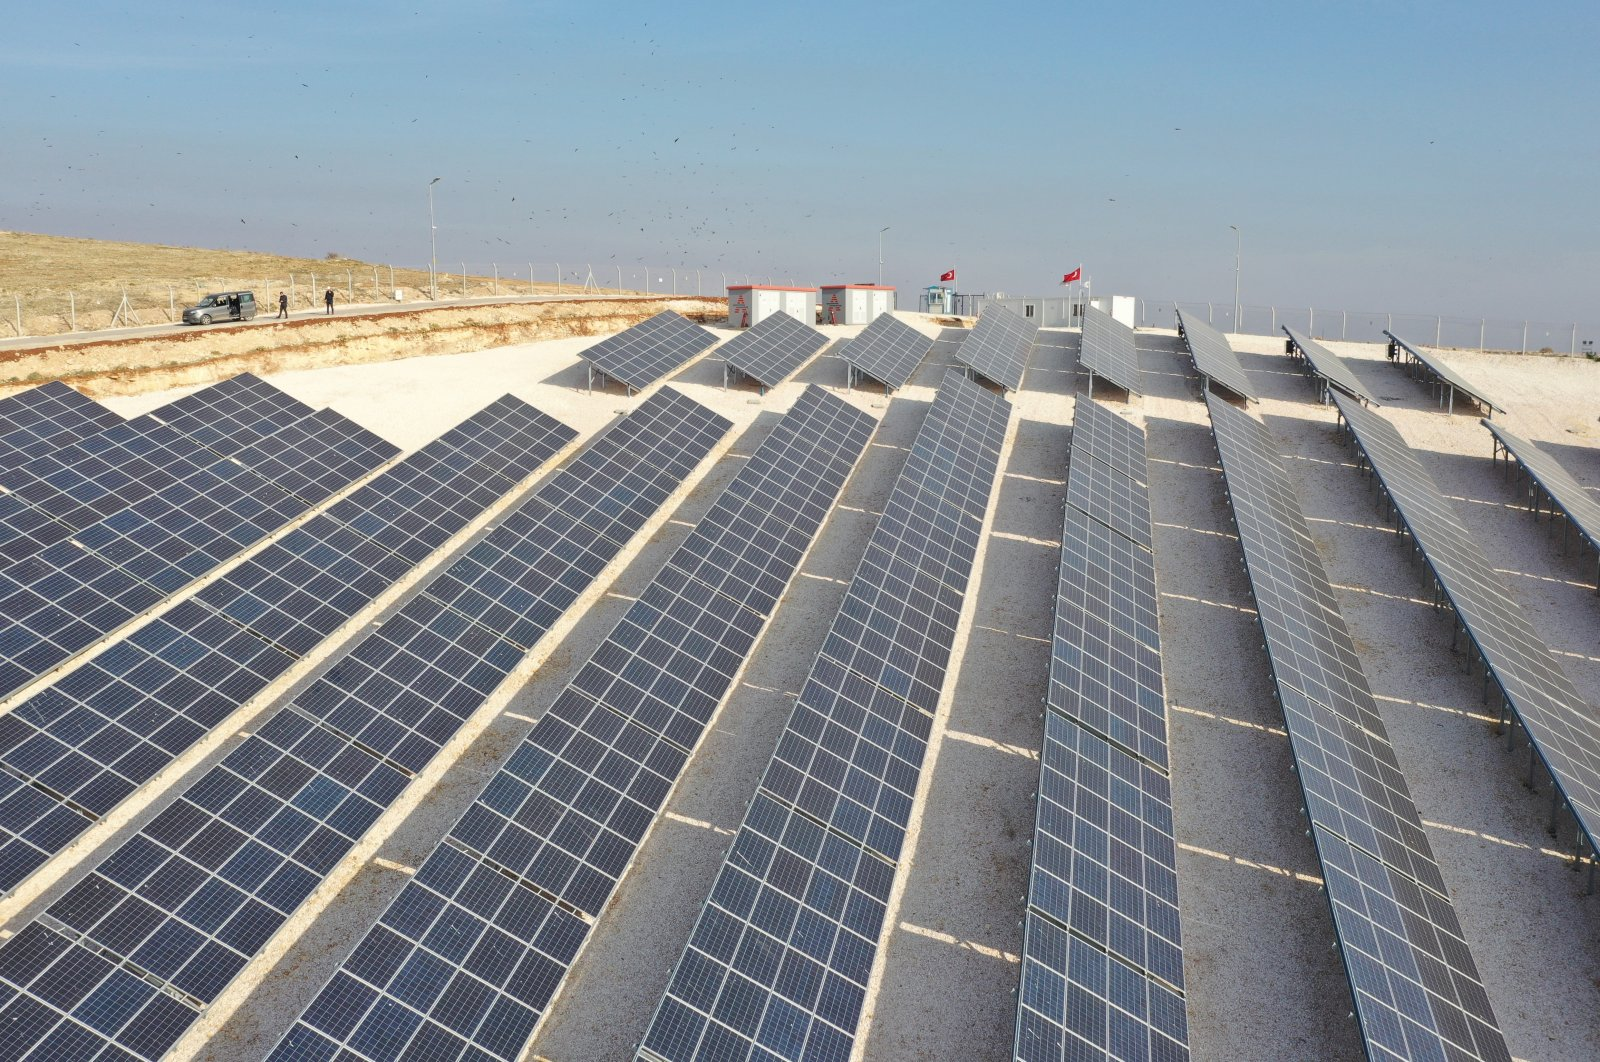 Solar panels in Gaziantep province, southeastern Turkey, March 15, 2021. (AA Photo)